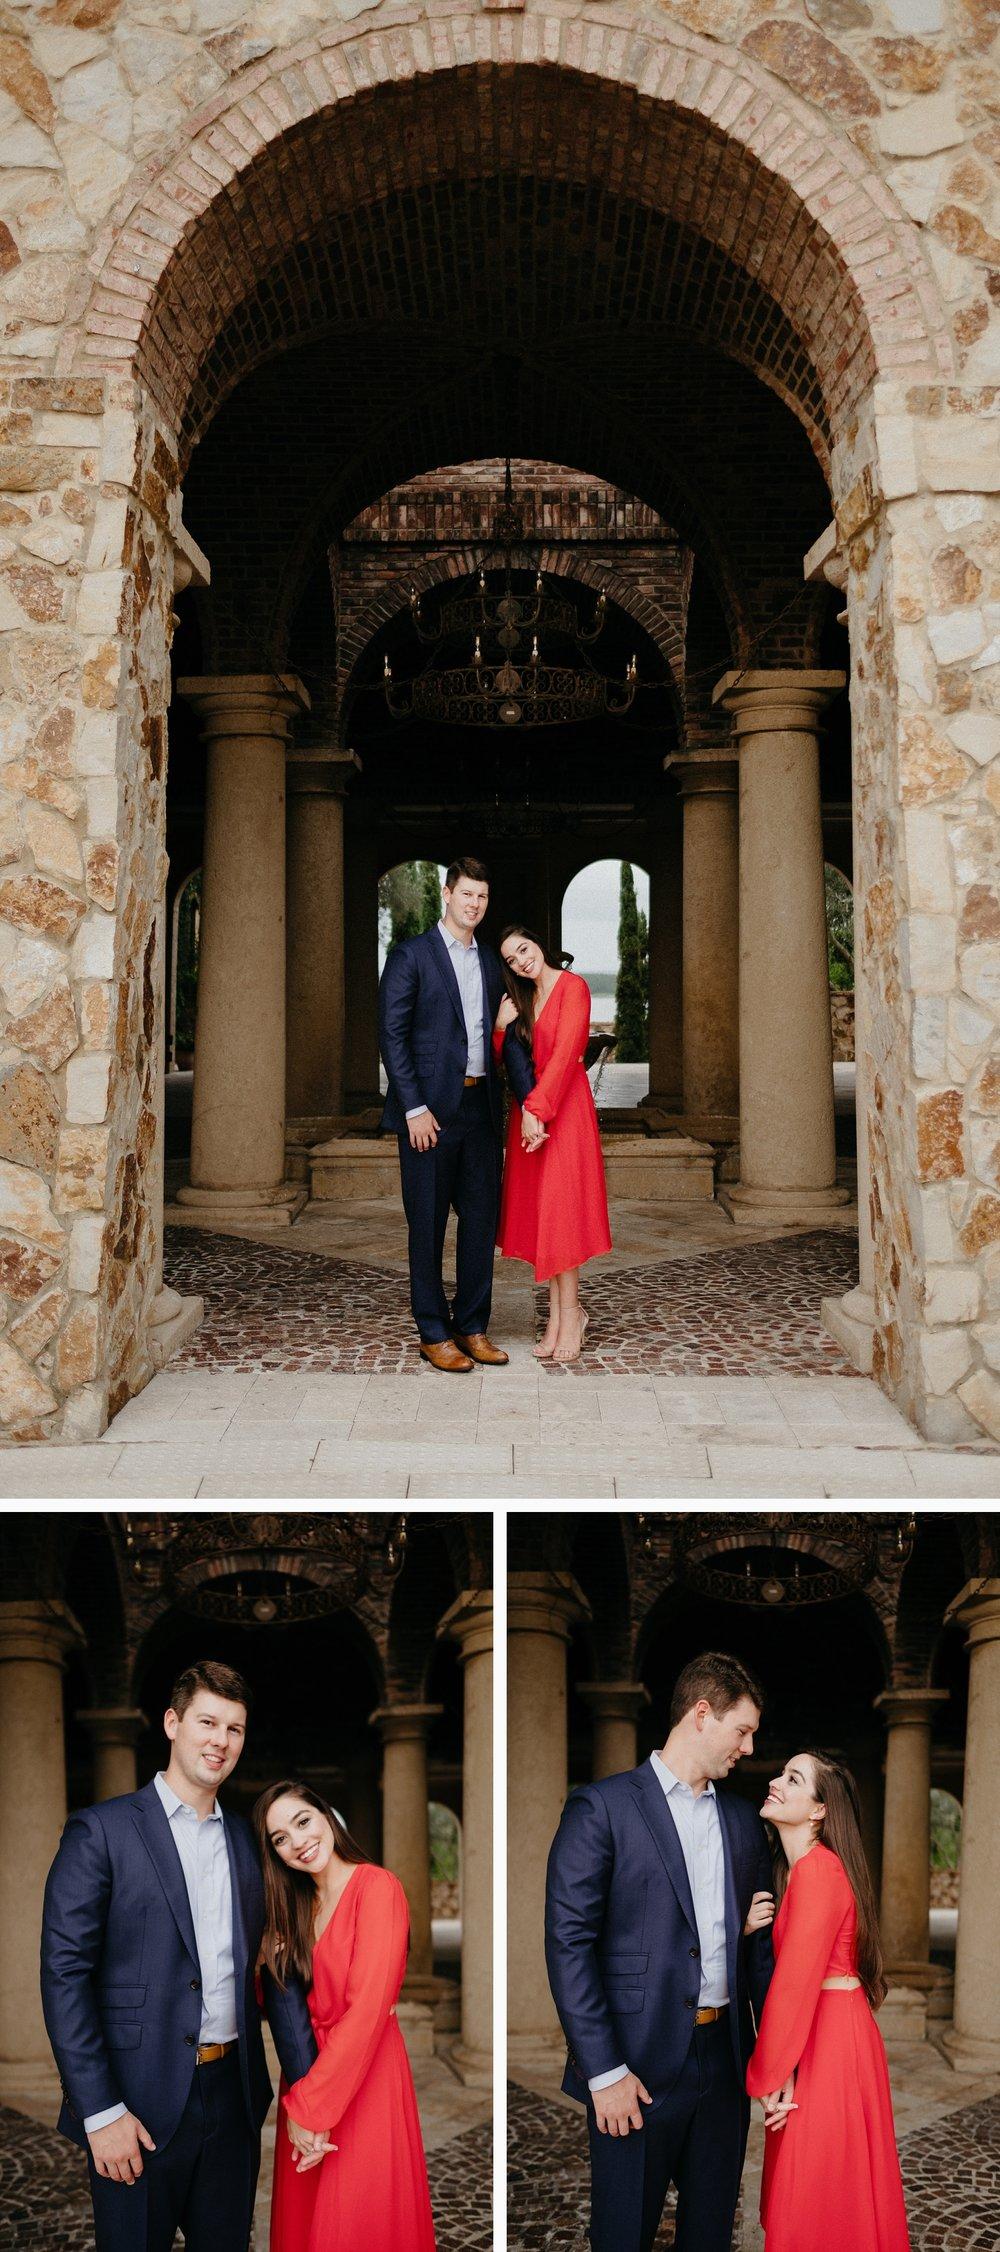 Megan-And-Jeremy-Bella-Collina-Engagement_0015.jpg